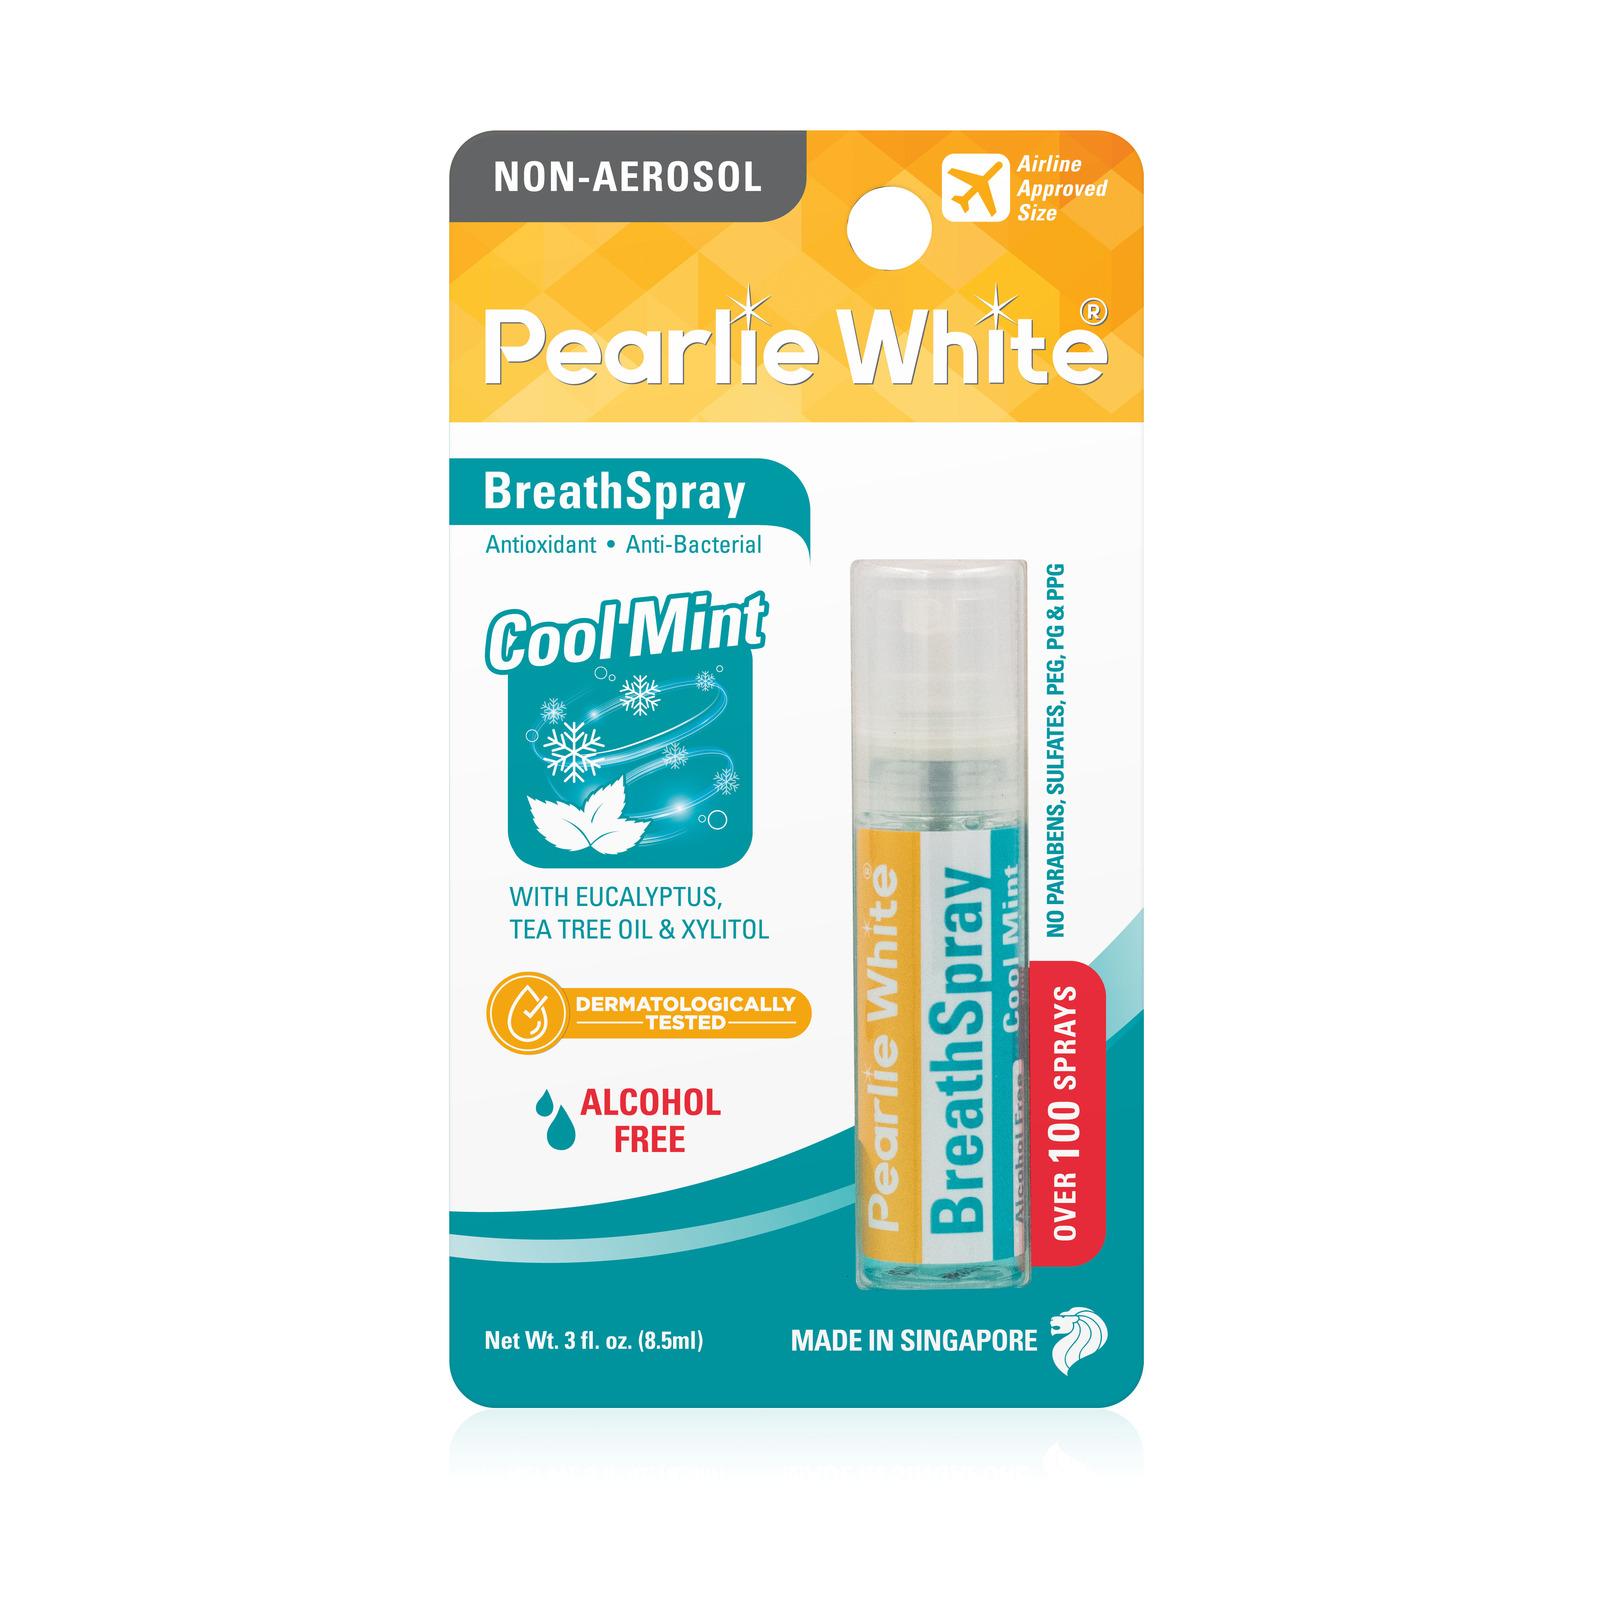 Pearlie White BreathSpray Breath Freshening Spray CoolMint